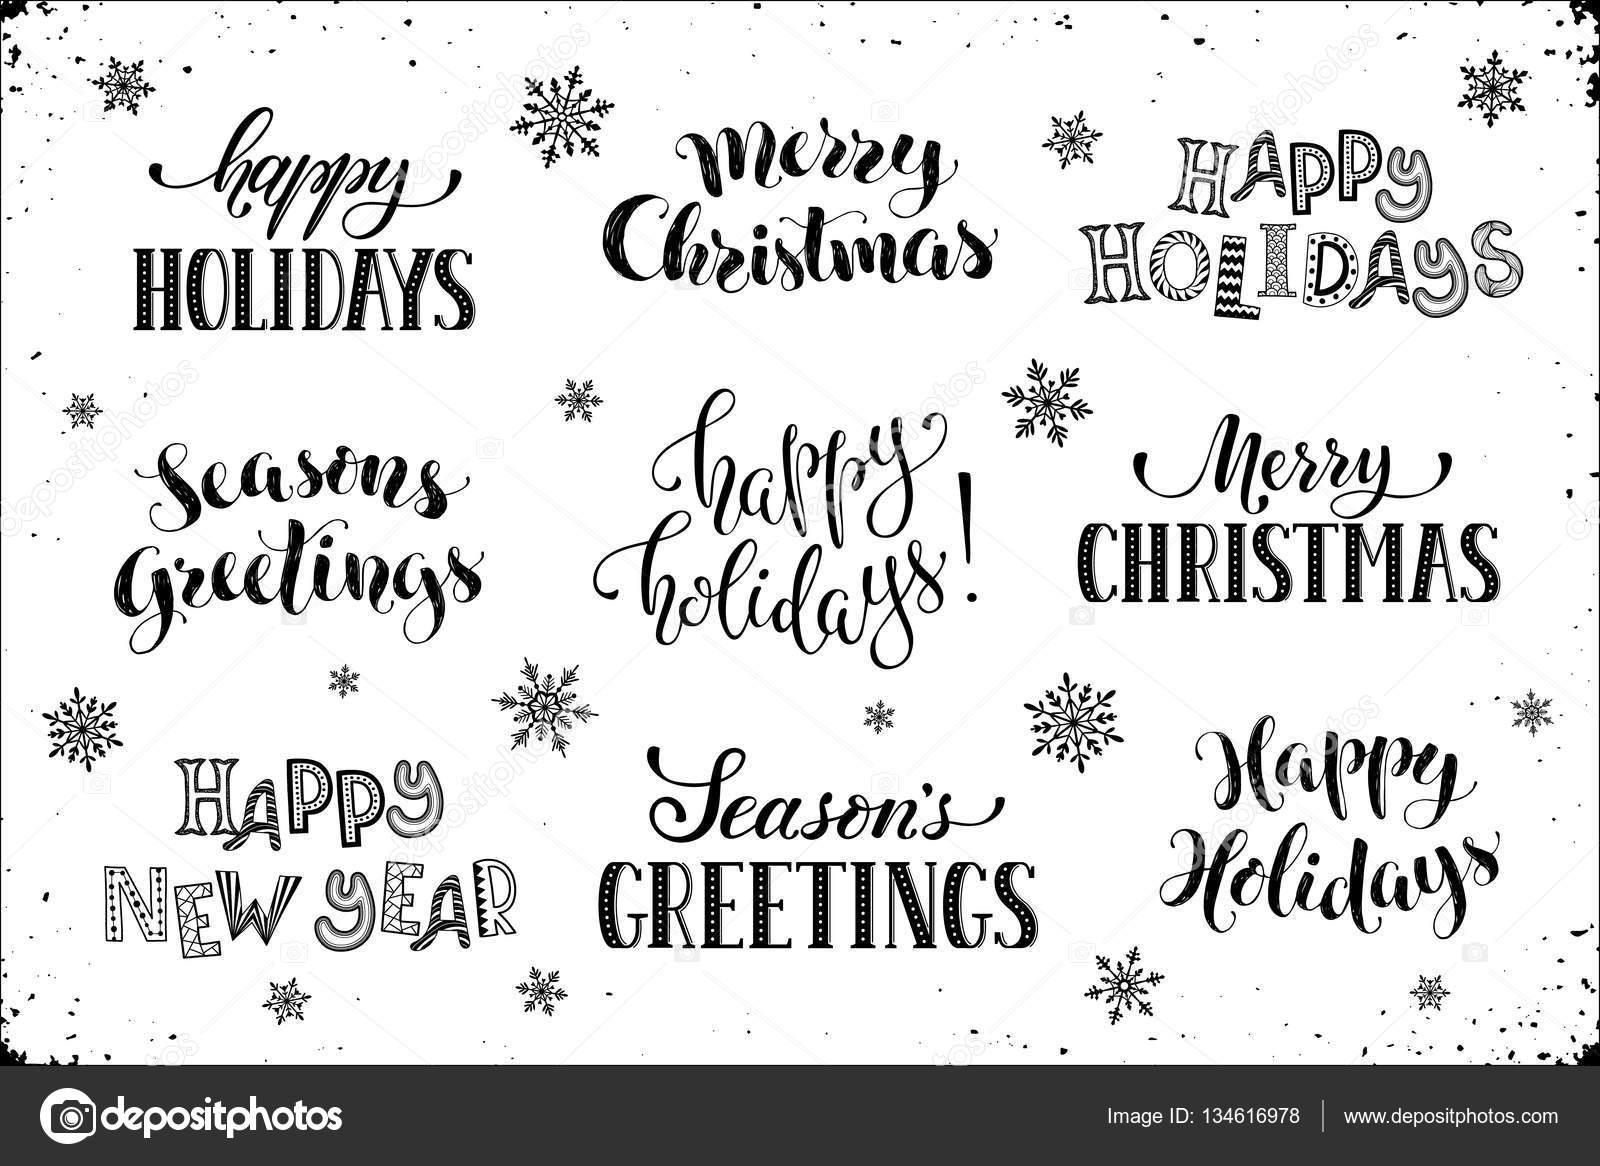 happy holidays phrases — Stock Vector © ollymolly #134616978